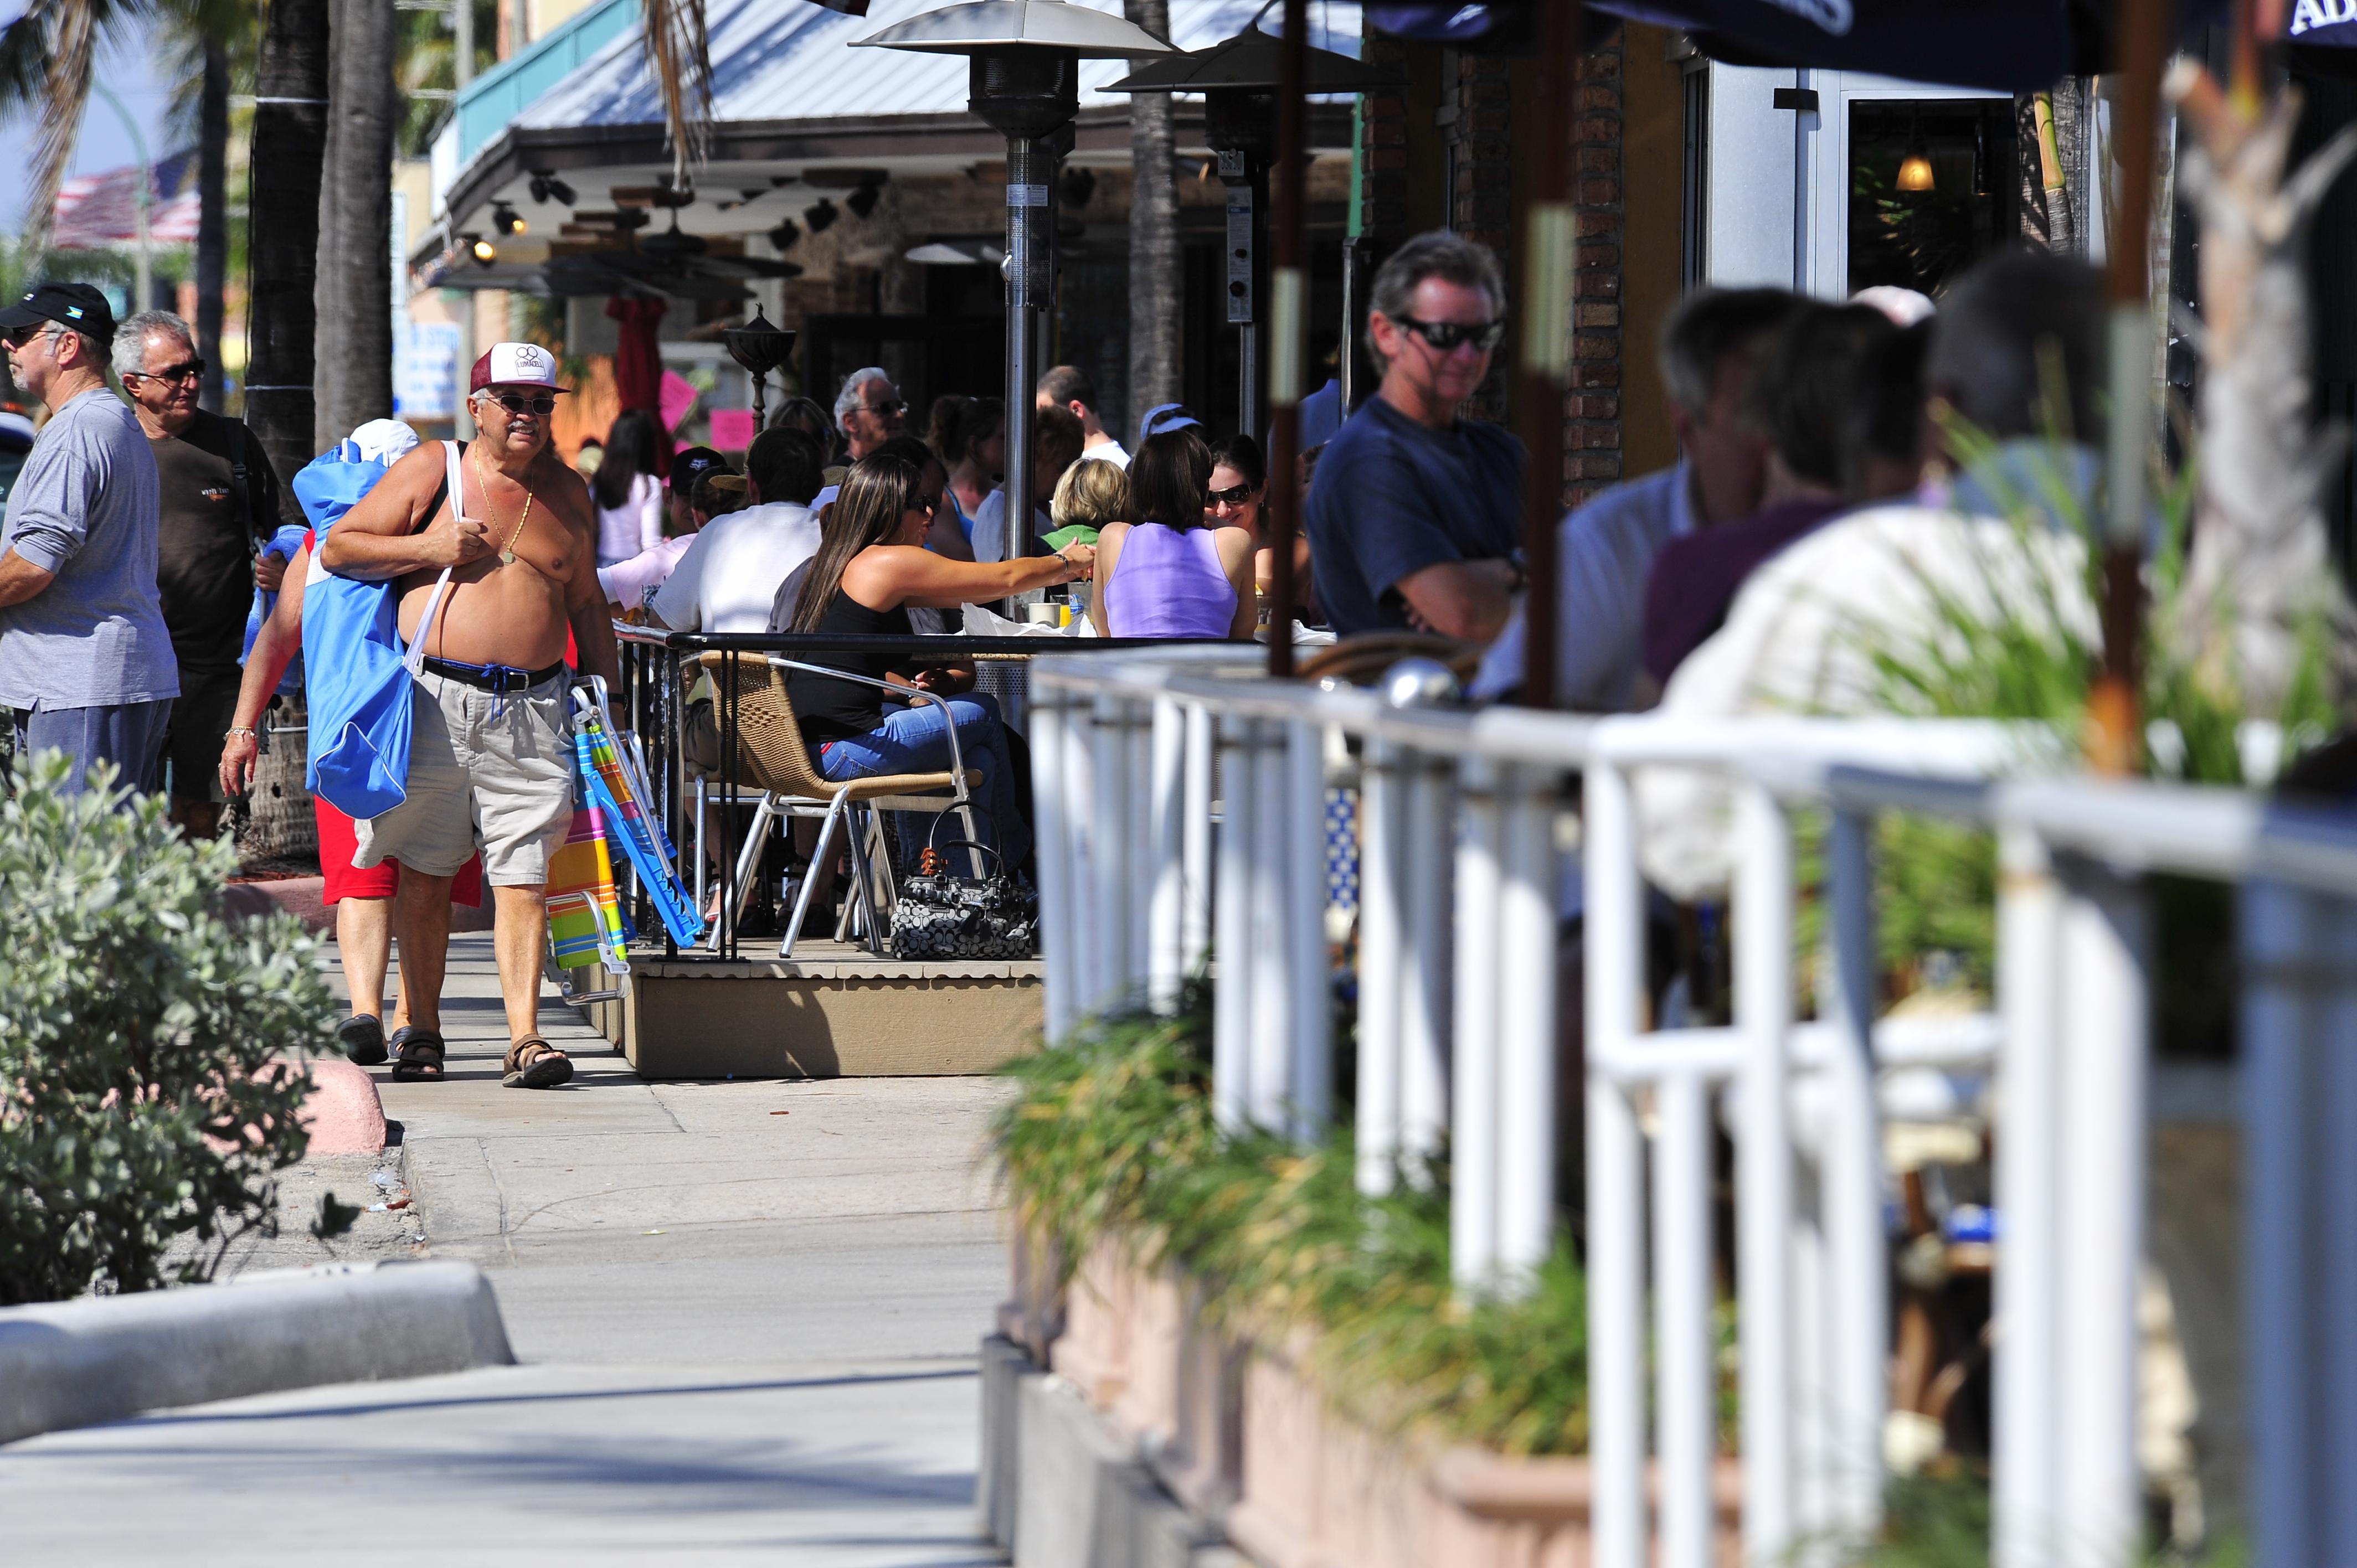 Diners & beachgoers